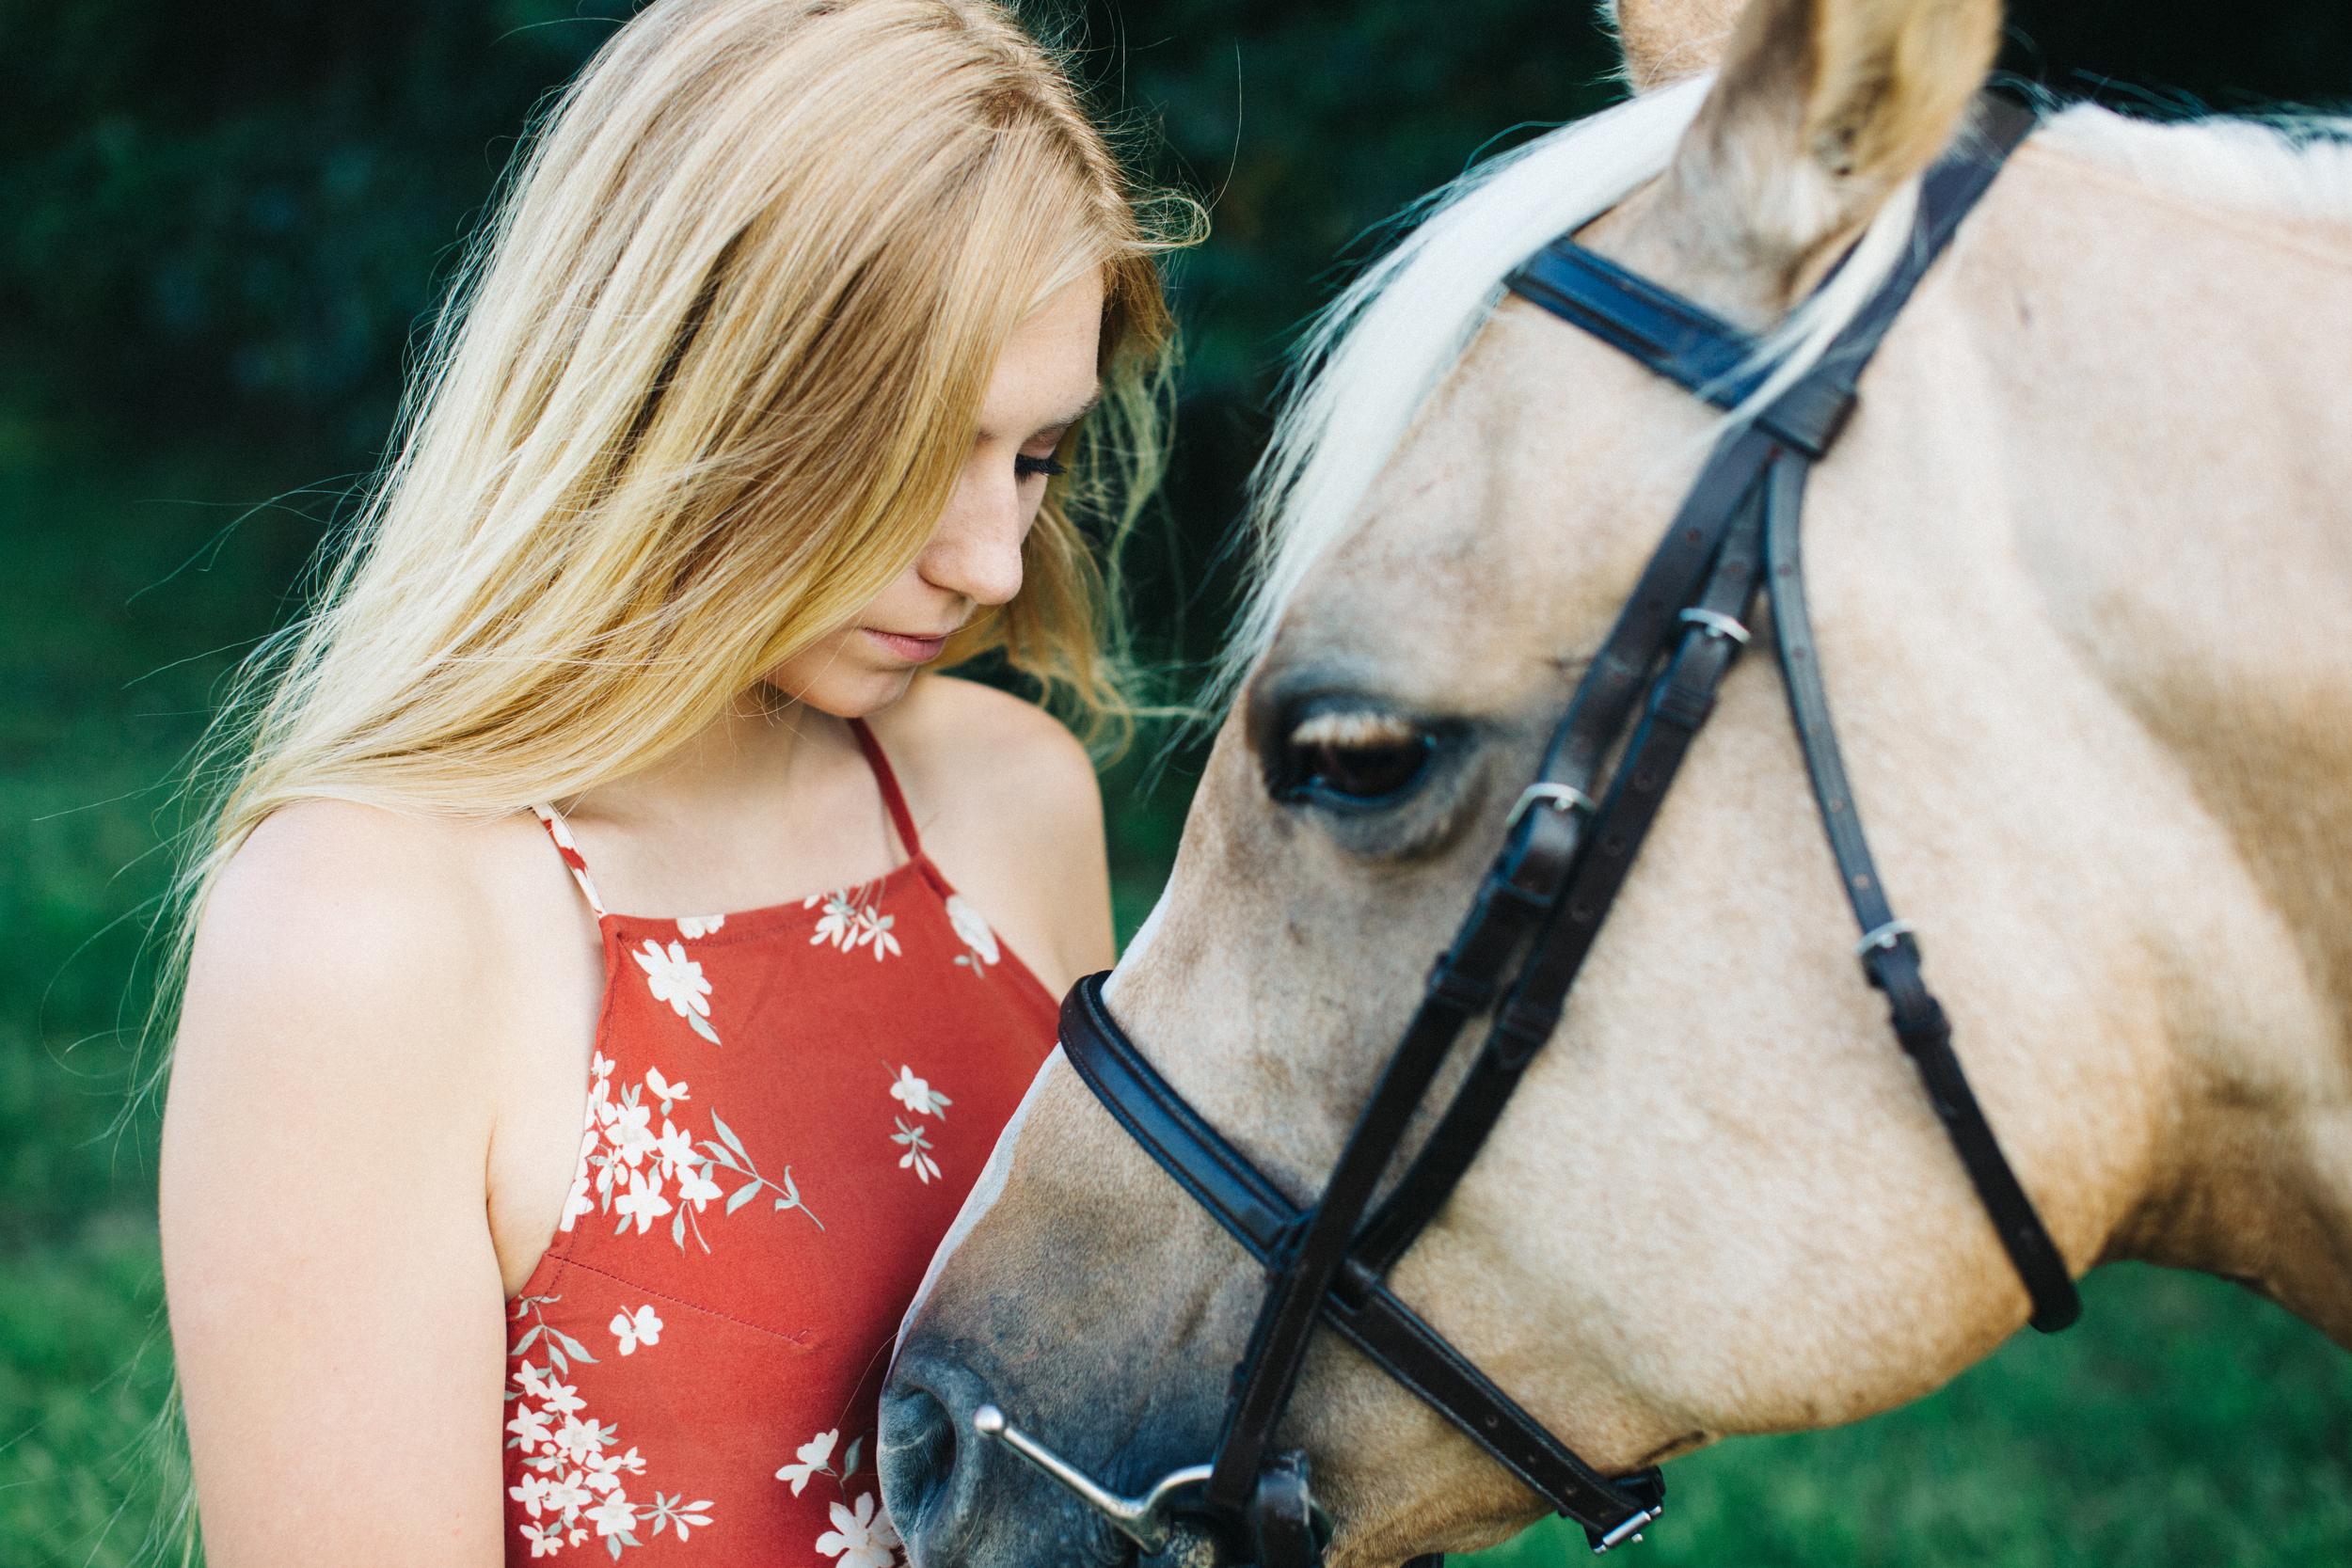 annapolis-maryland-senior-portrait-session-photographer-boho-horse-inspo-emma-jean-photography-5-photo.jpg